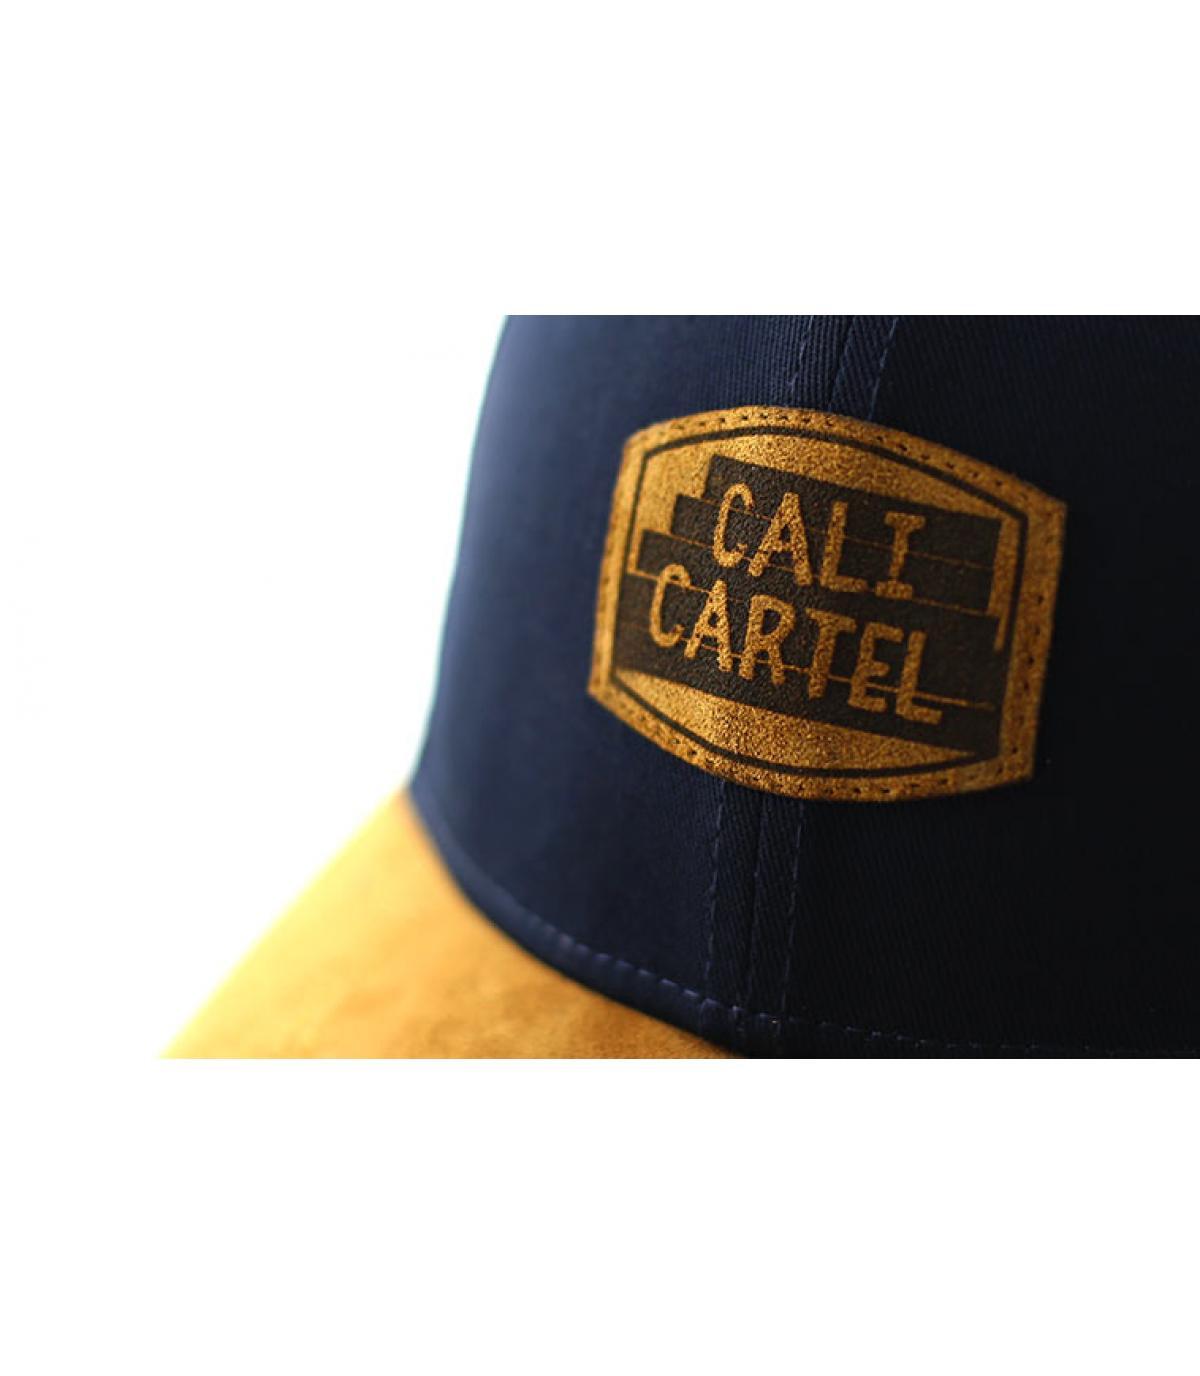 Details Curve Cali Cartel navy suede - Abbildung 3